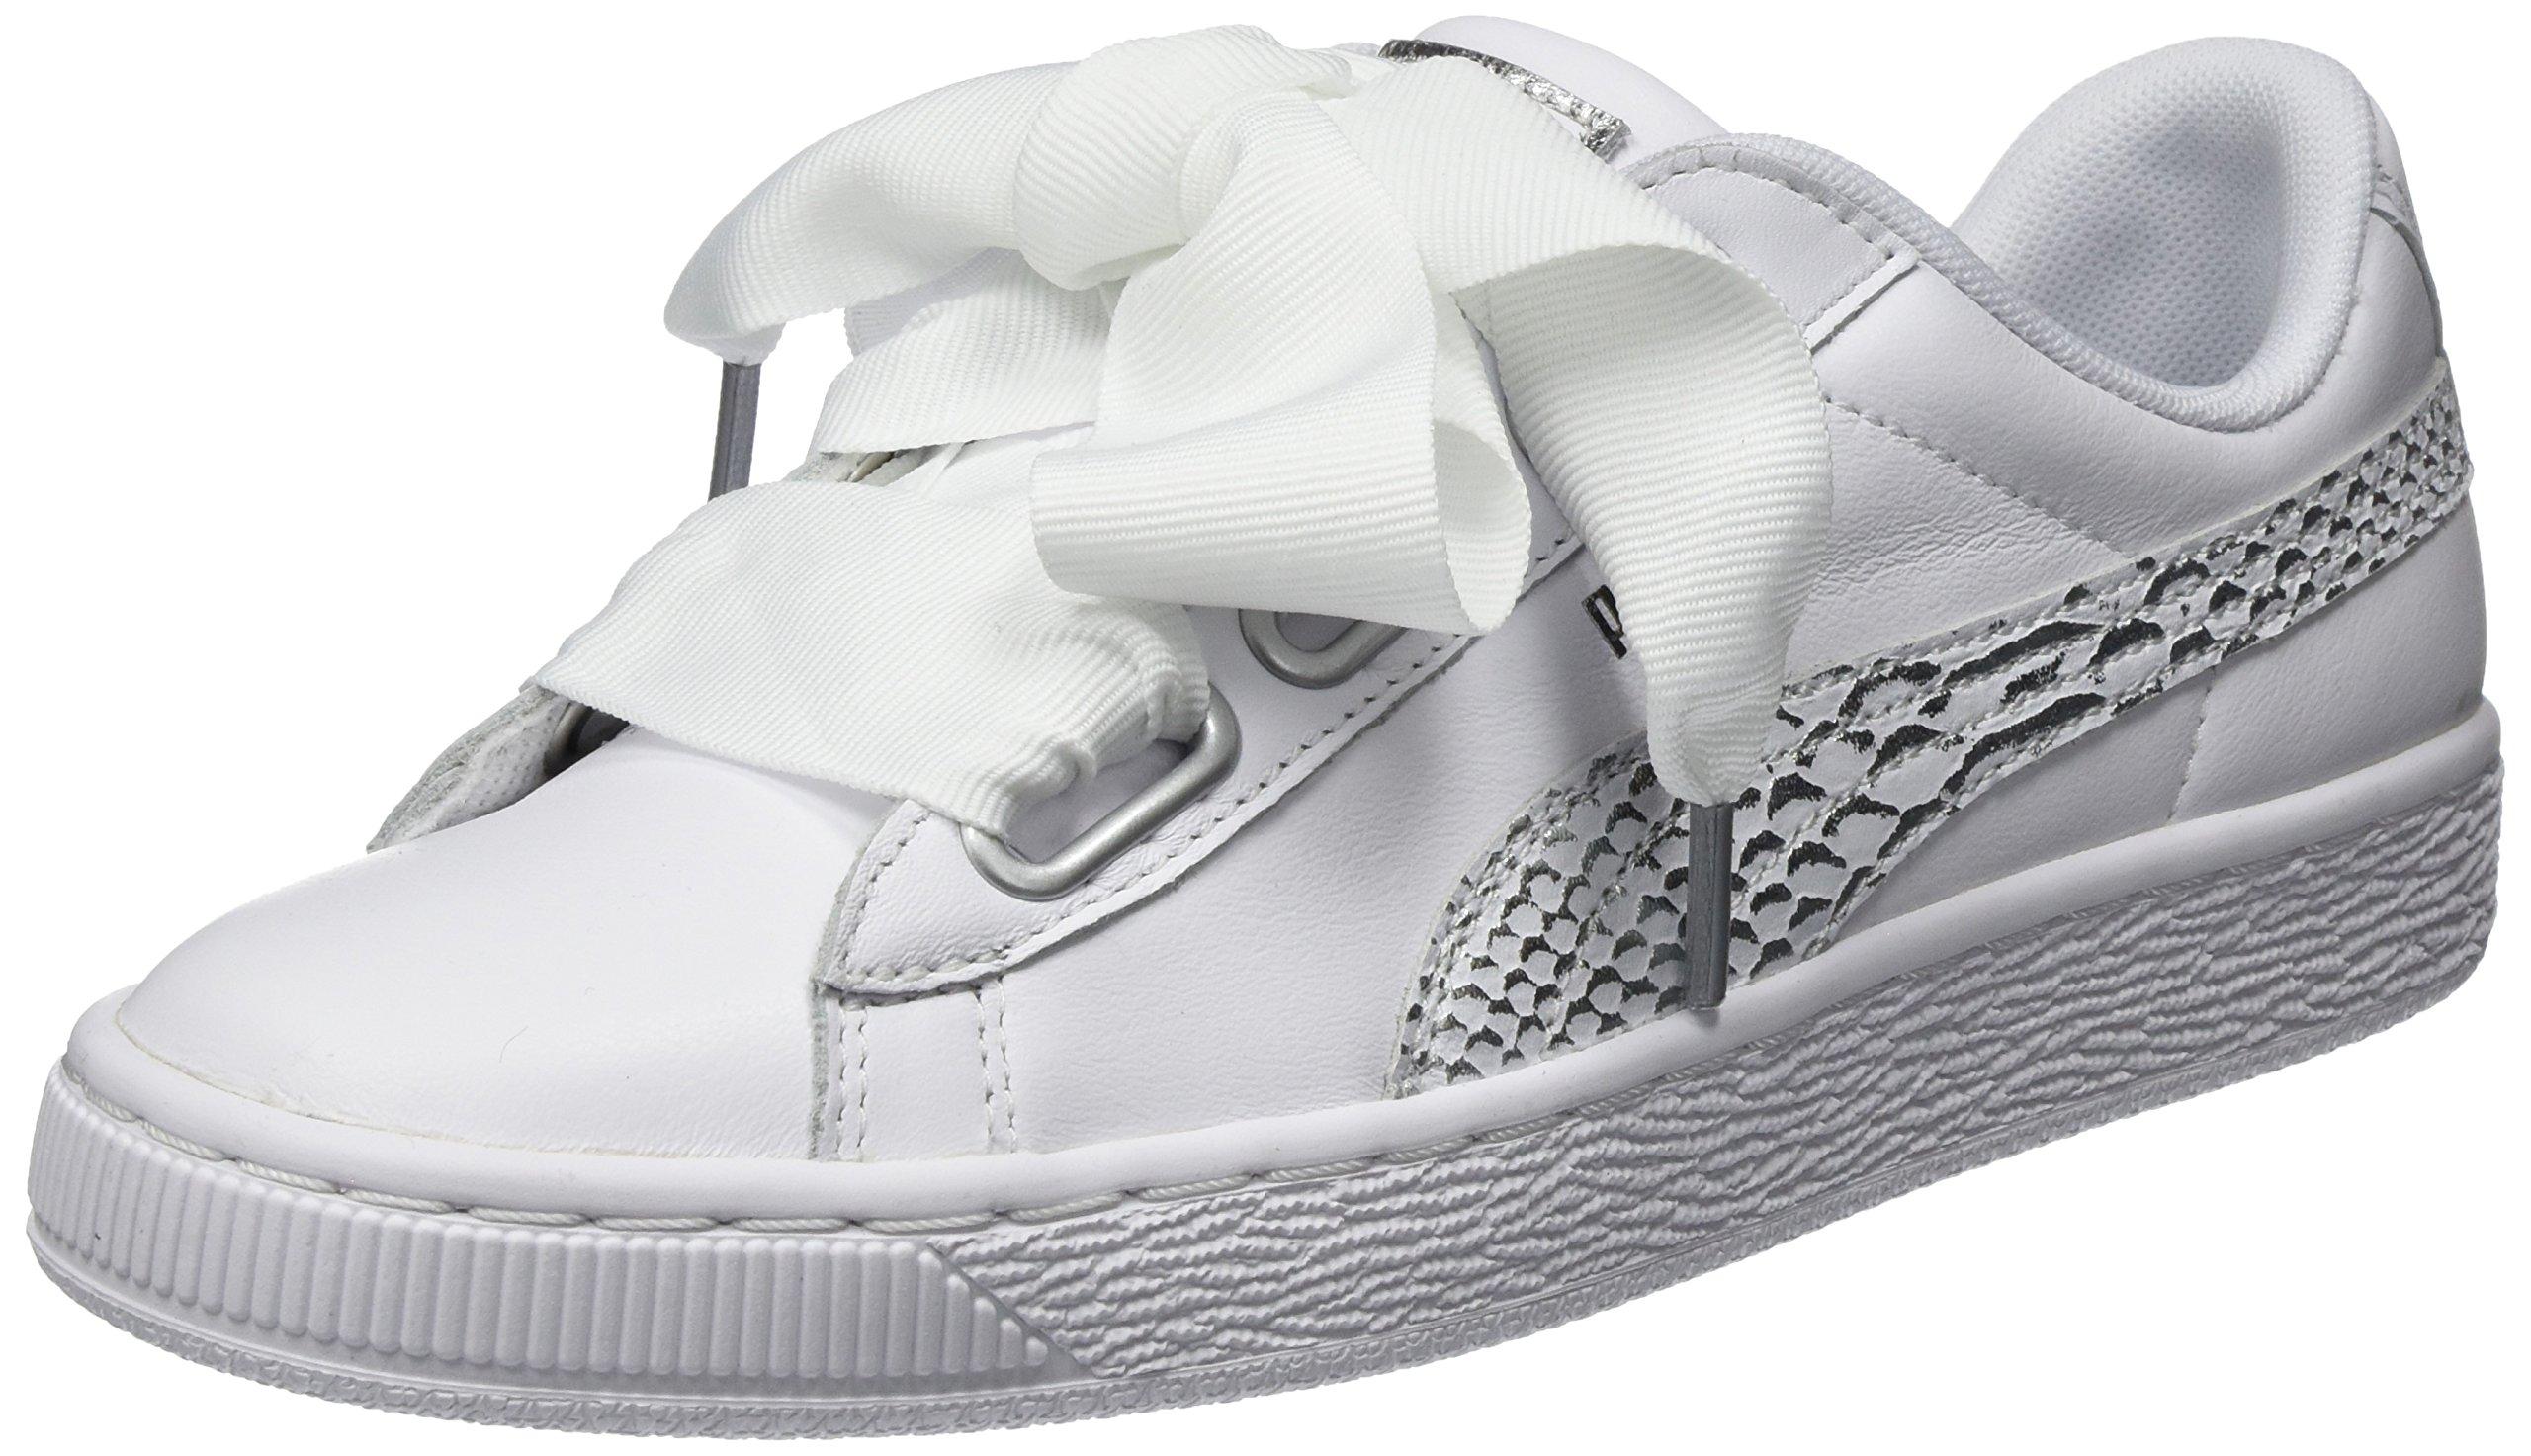 FemmeBlanc Basses Puma Basket White39 Eu OceanaireSneakers Heart vN8nw0m